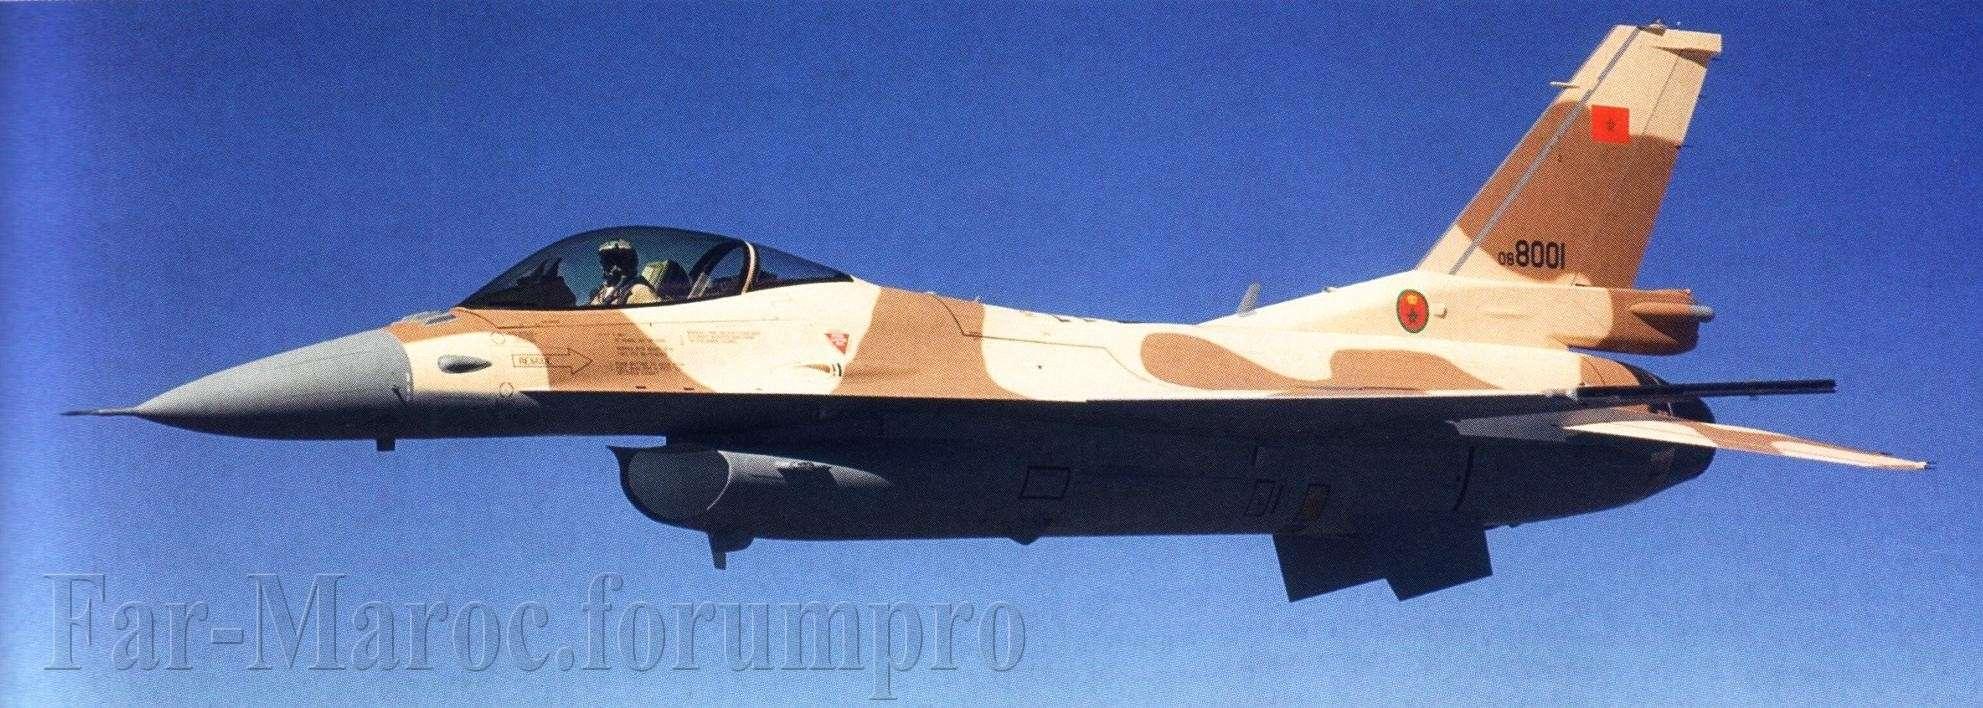 Photos RMAF F-16 C/D Block 52+ - Page 2 Rmaf_f14